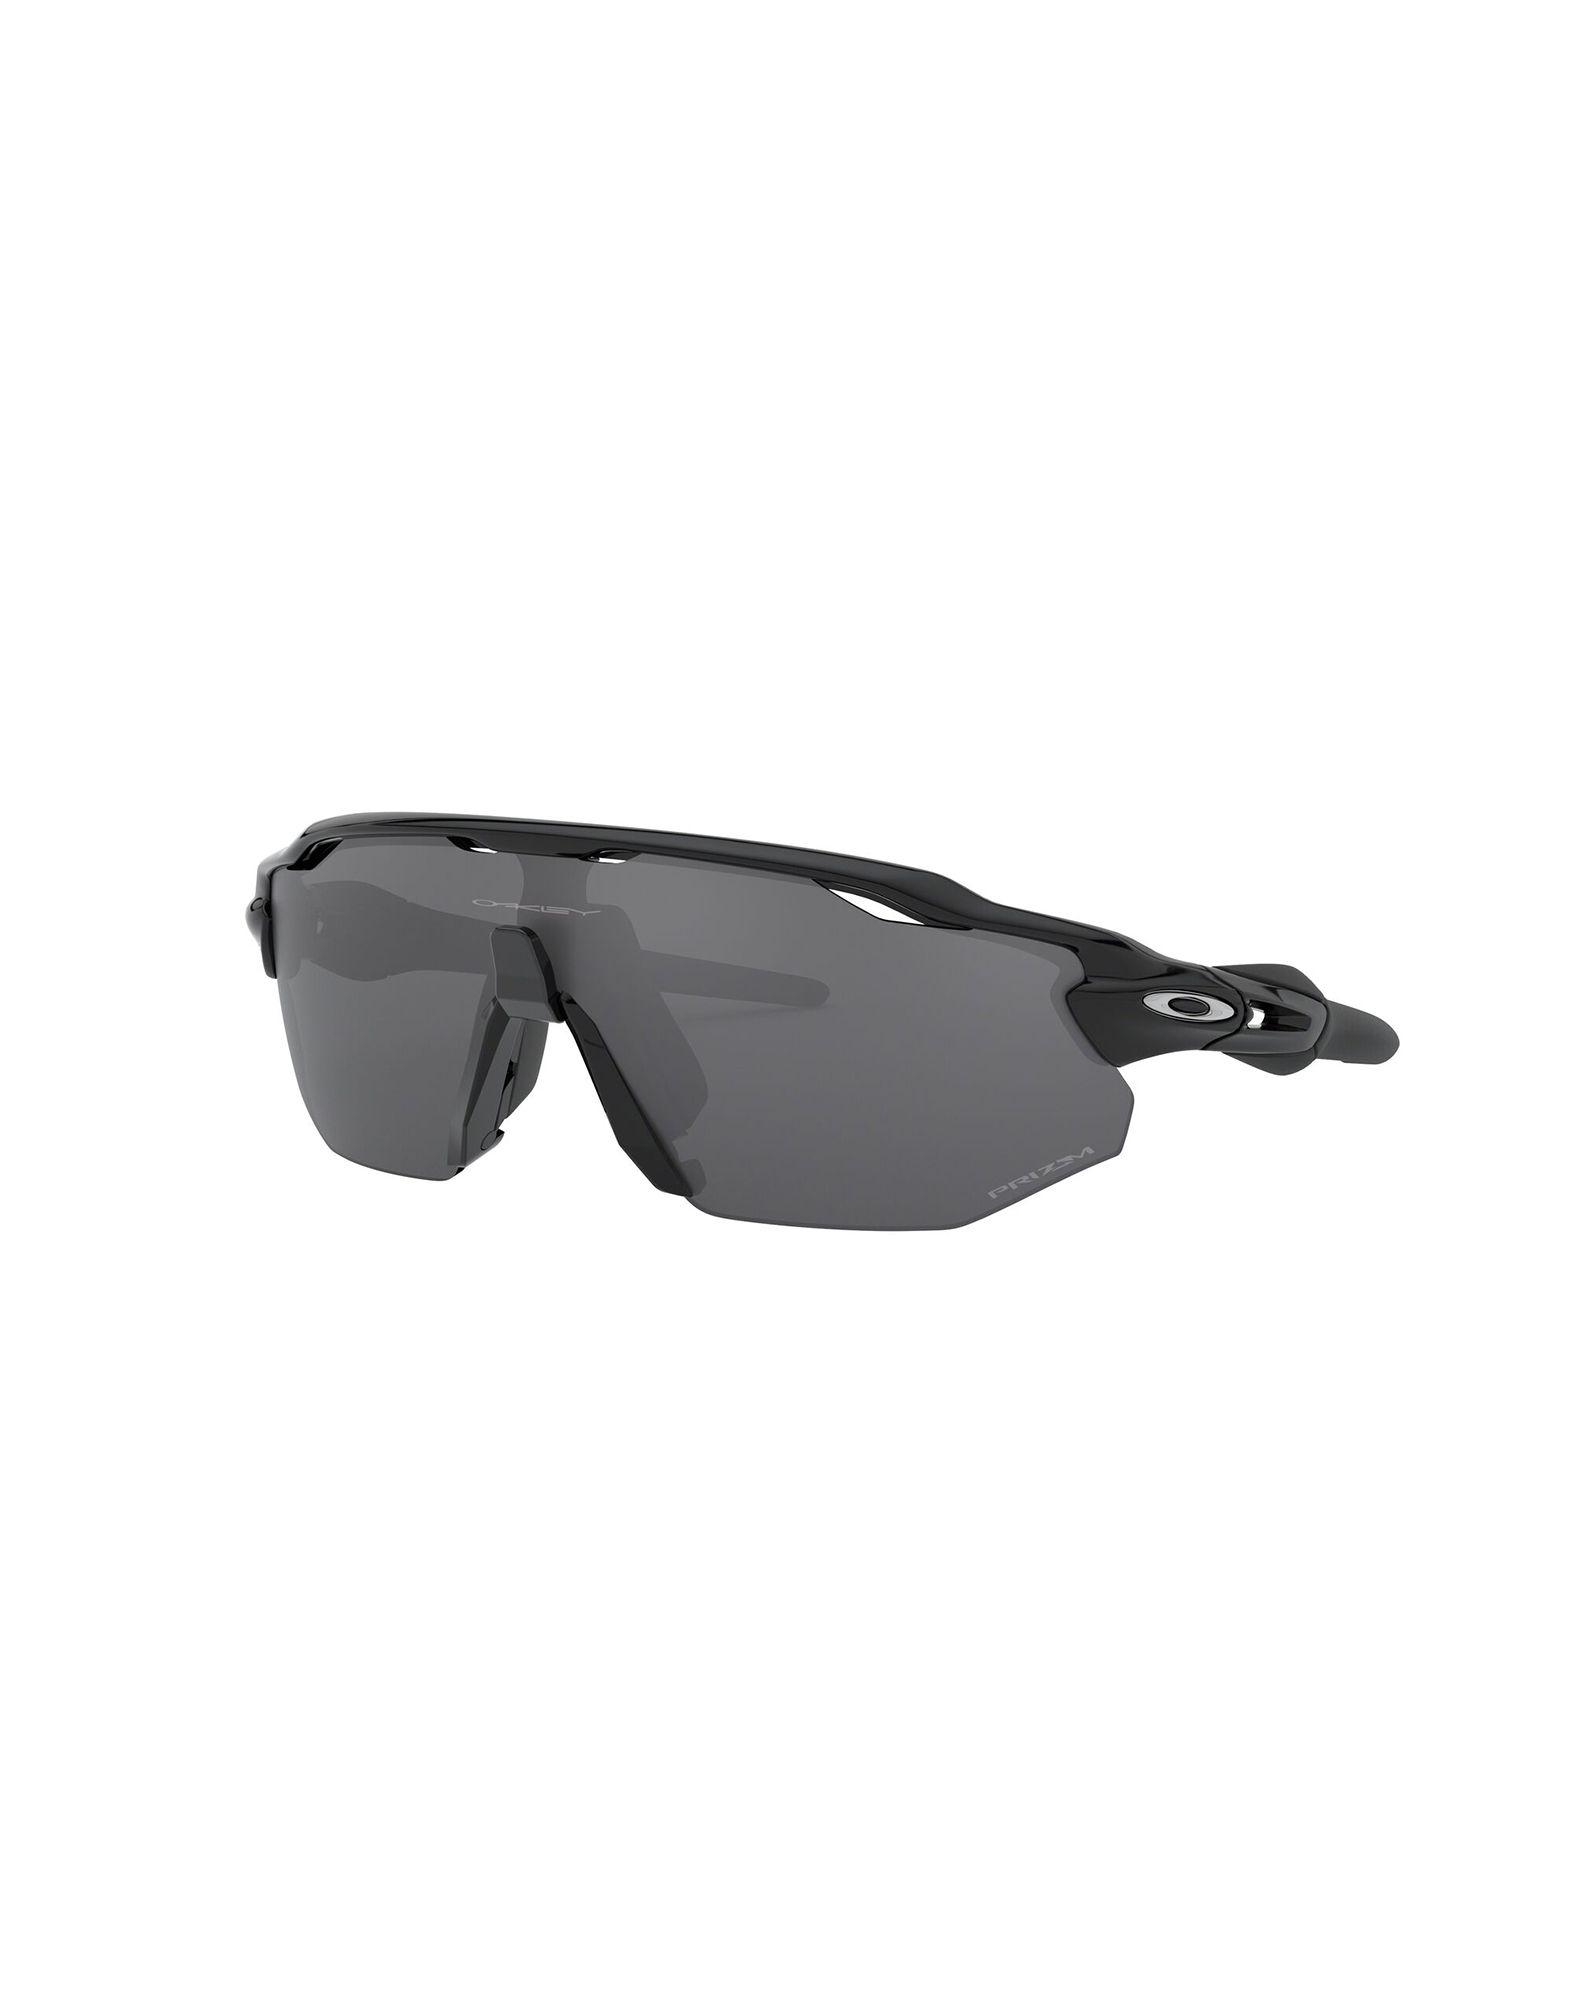 Фото - OAKLEY Солнечные очки 3d очки